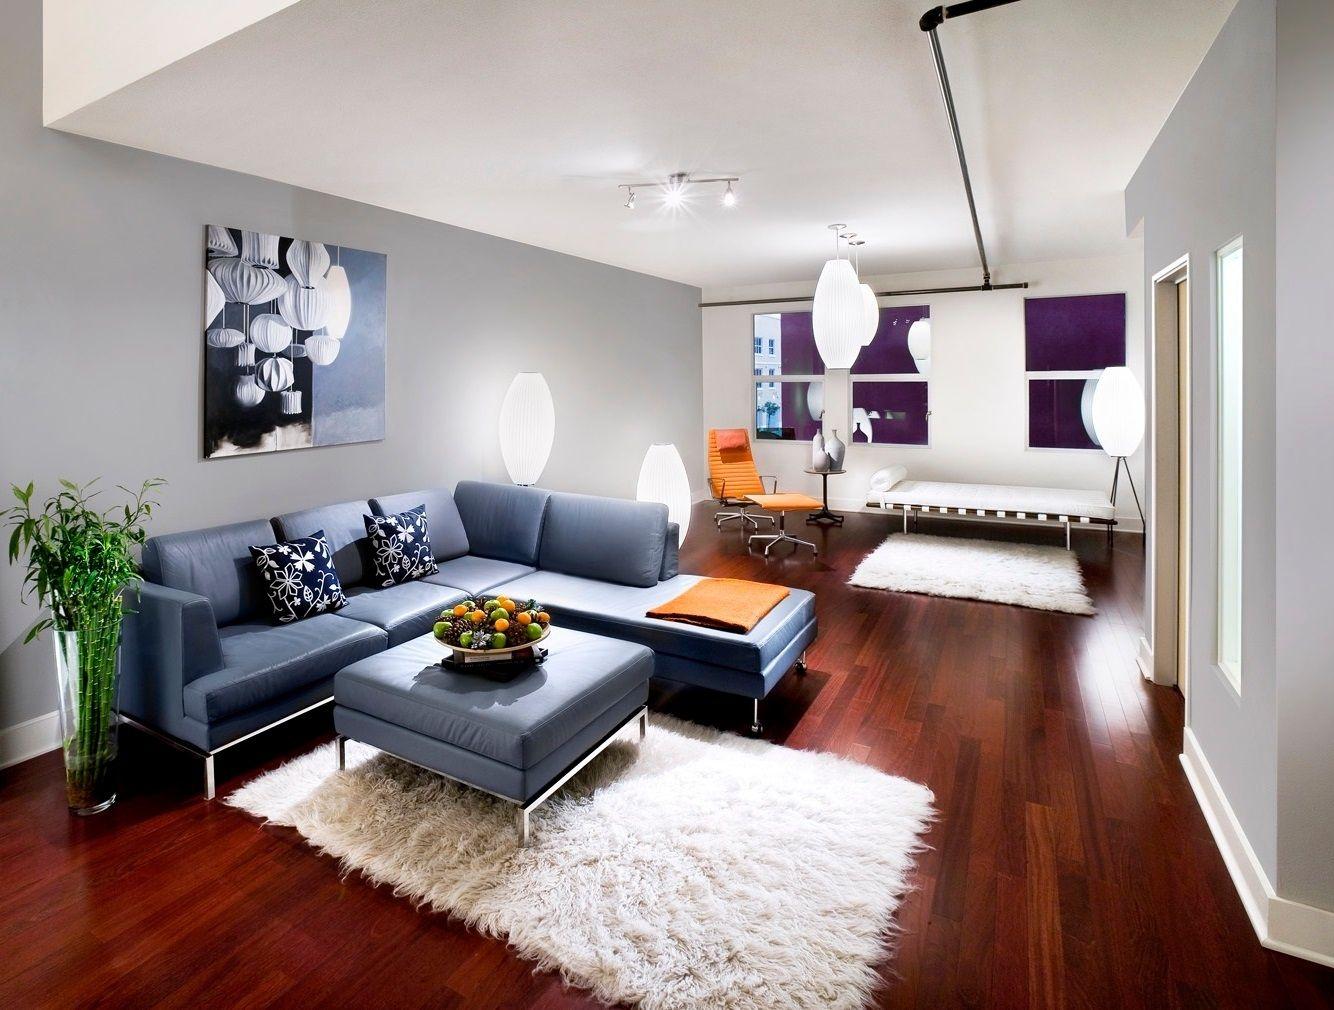 25 Best Modern Living Room Design Ideas Living Room Wood Floor